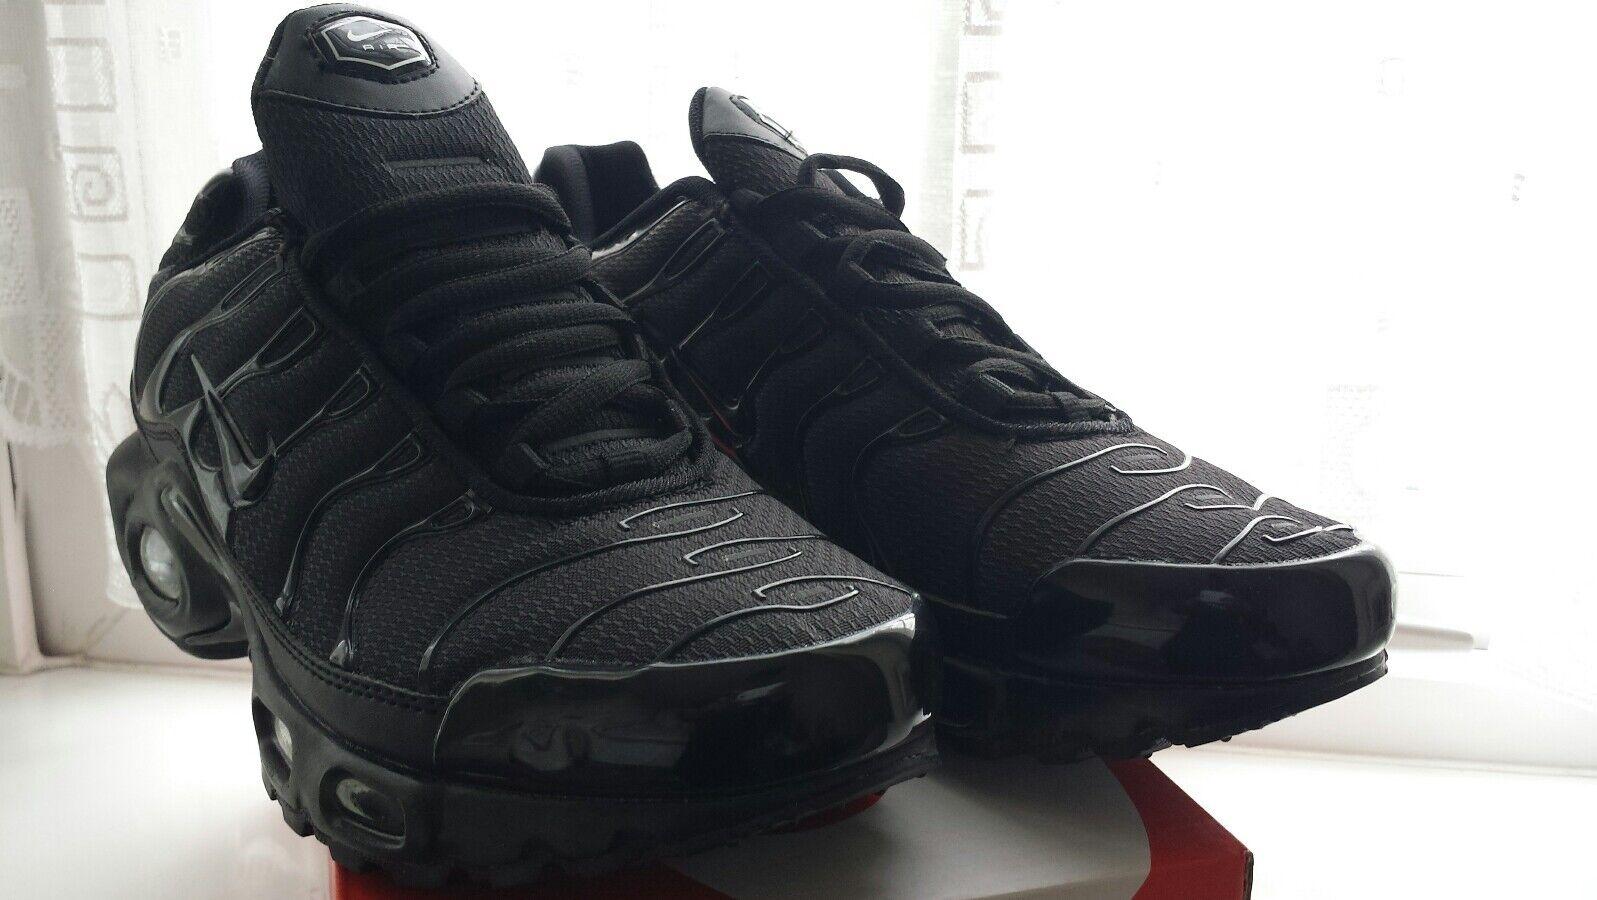 Bnwb Nike Air Max TN Plus Size Size Plus 9 triple negro modelo mas vendido de la marca 08d019